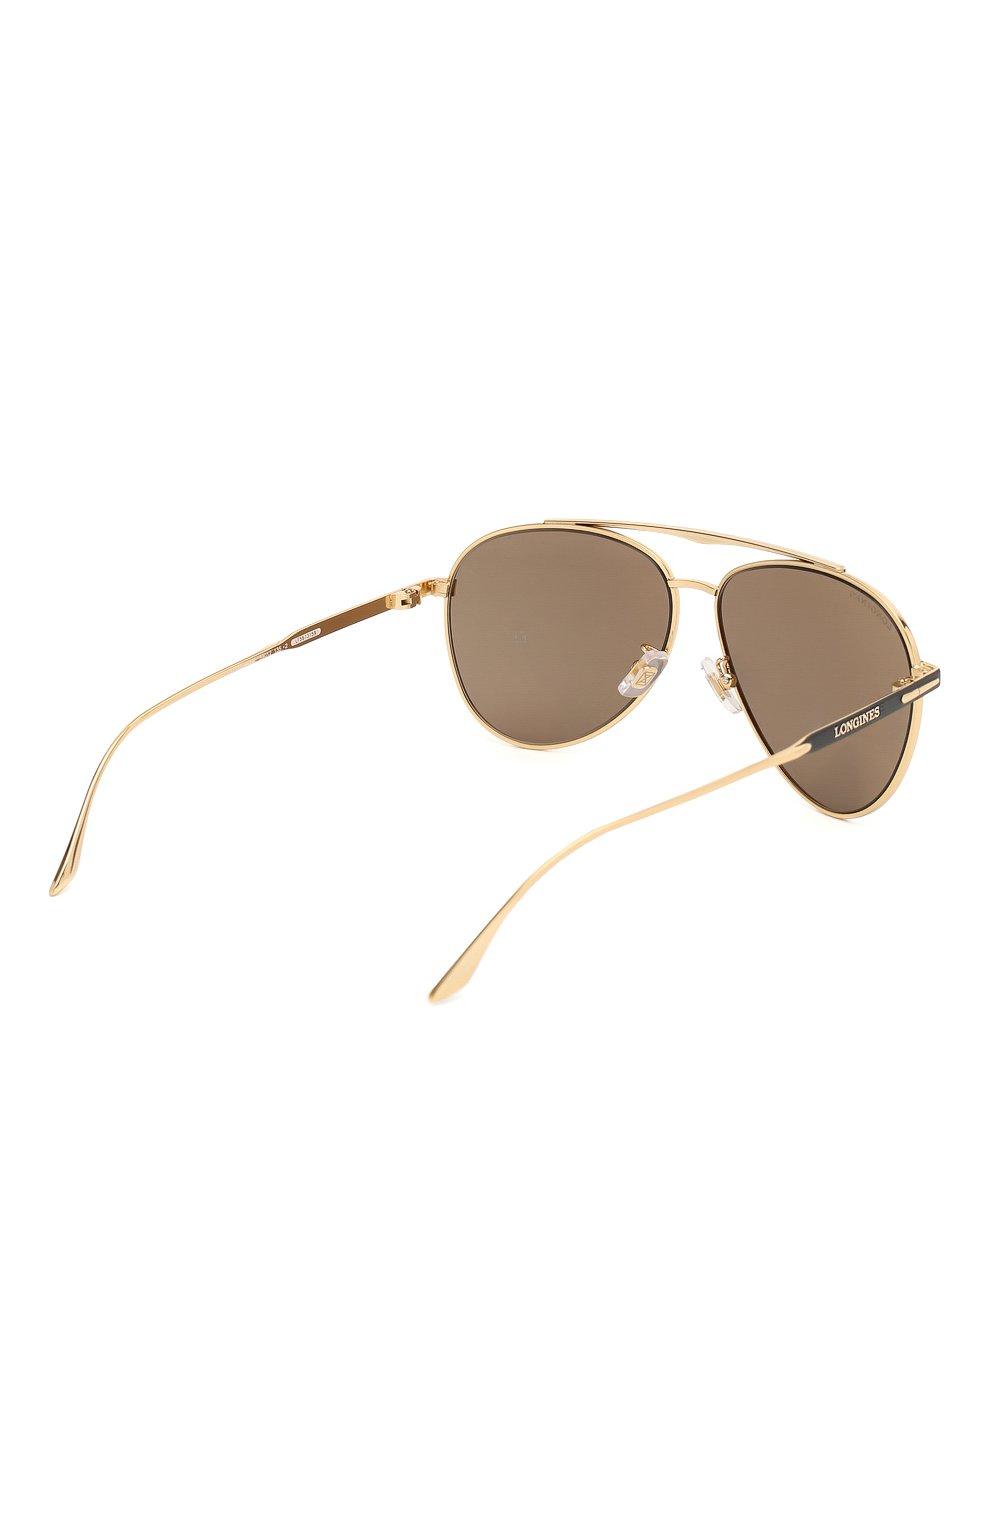 Мужские солнцезащитные очки LONGINES черного цвета, арт. LG0005-H 02L | Фото 4 (Тип очков: С/з; Очки форма: Авиаторы; Оптика Гендер: оптика-мужское)